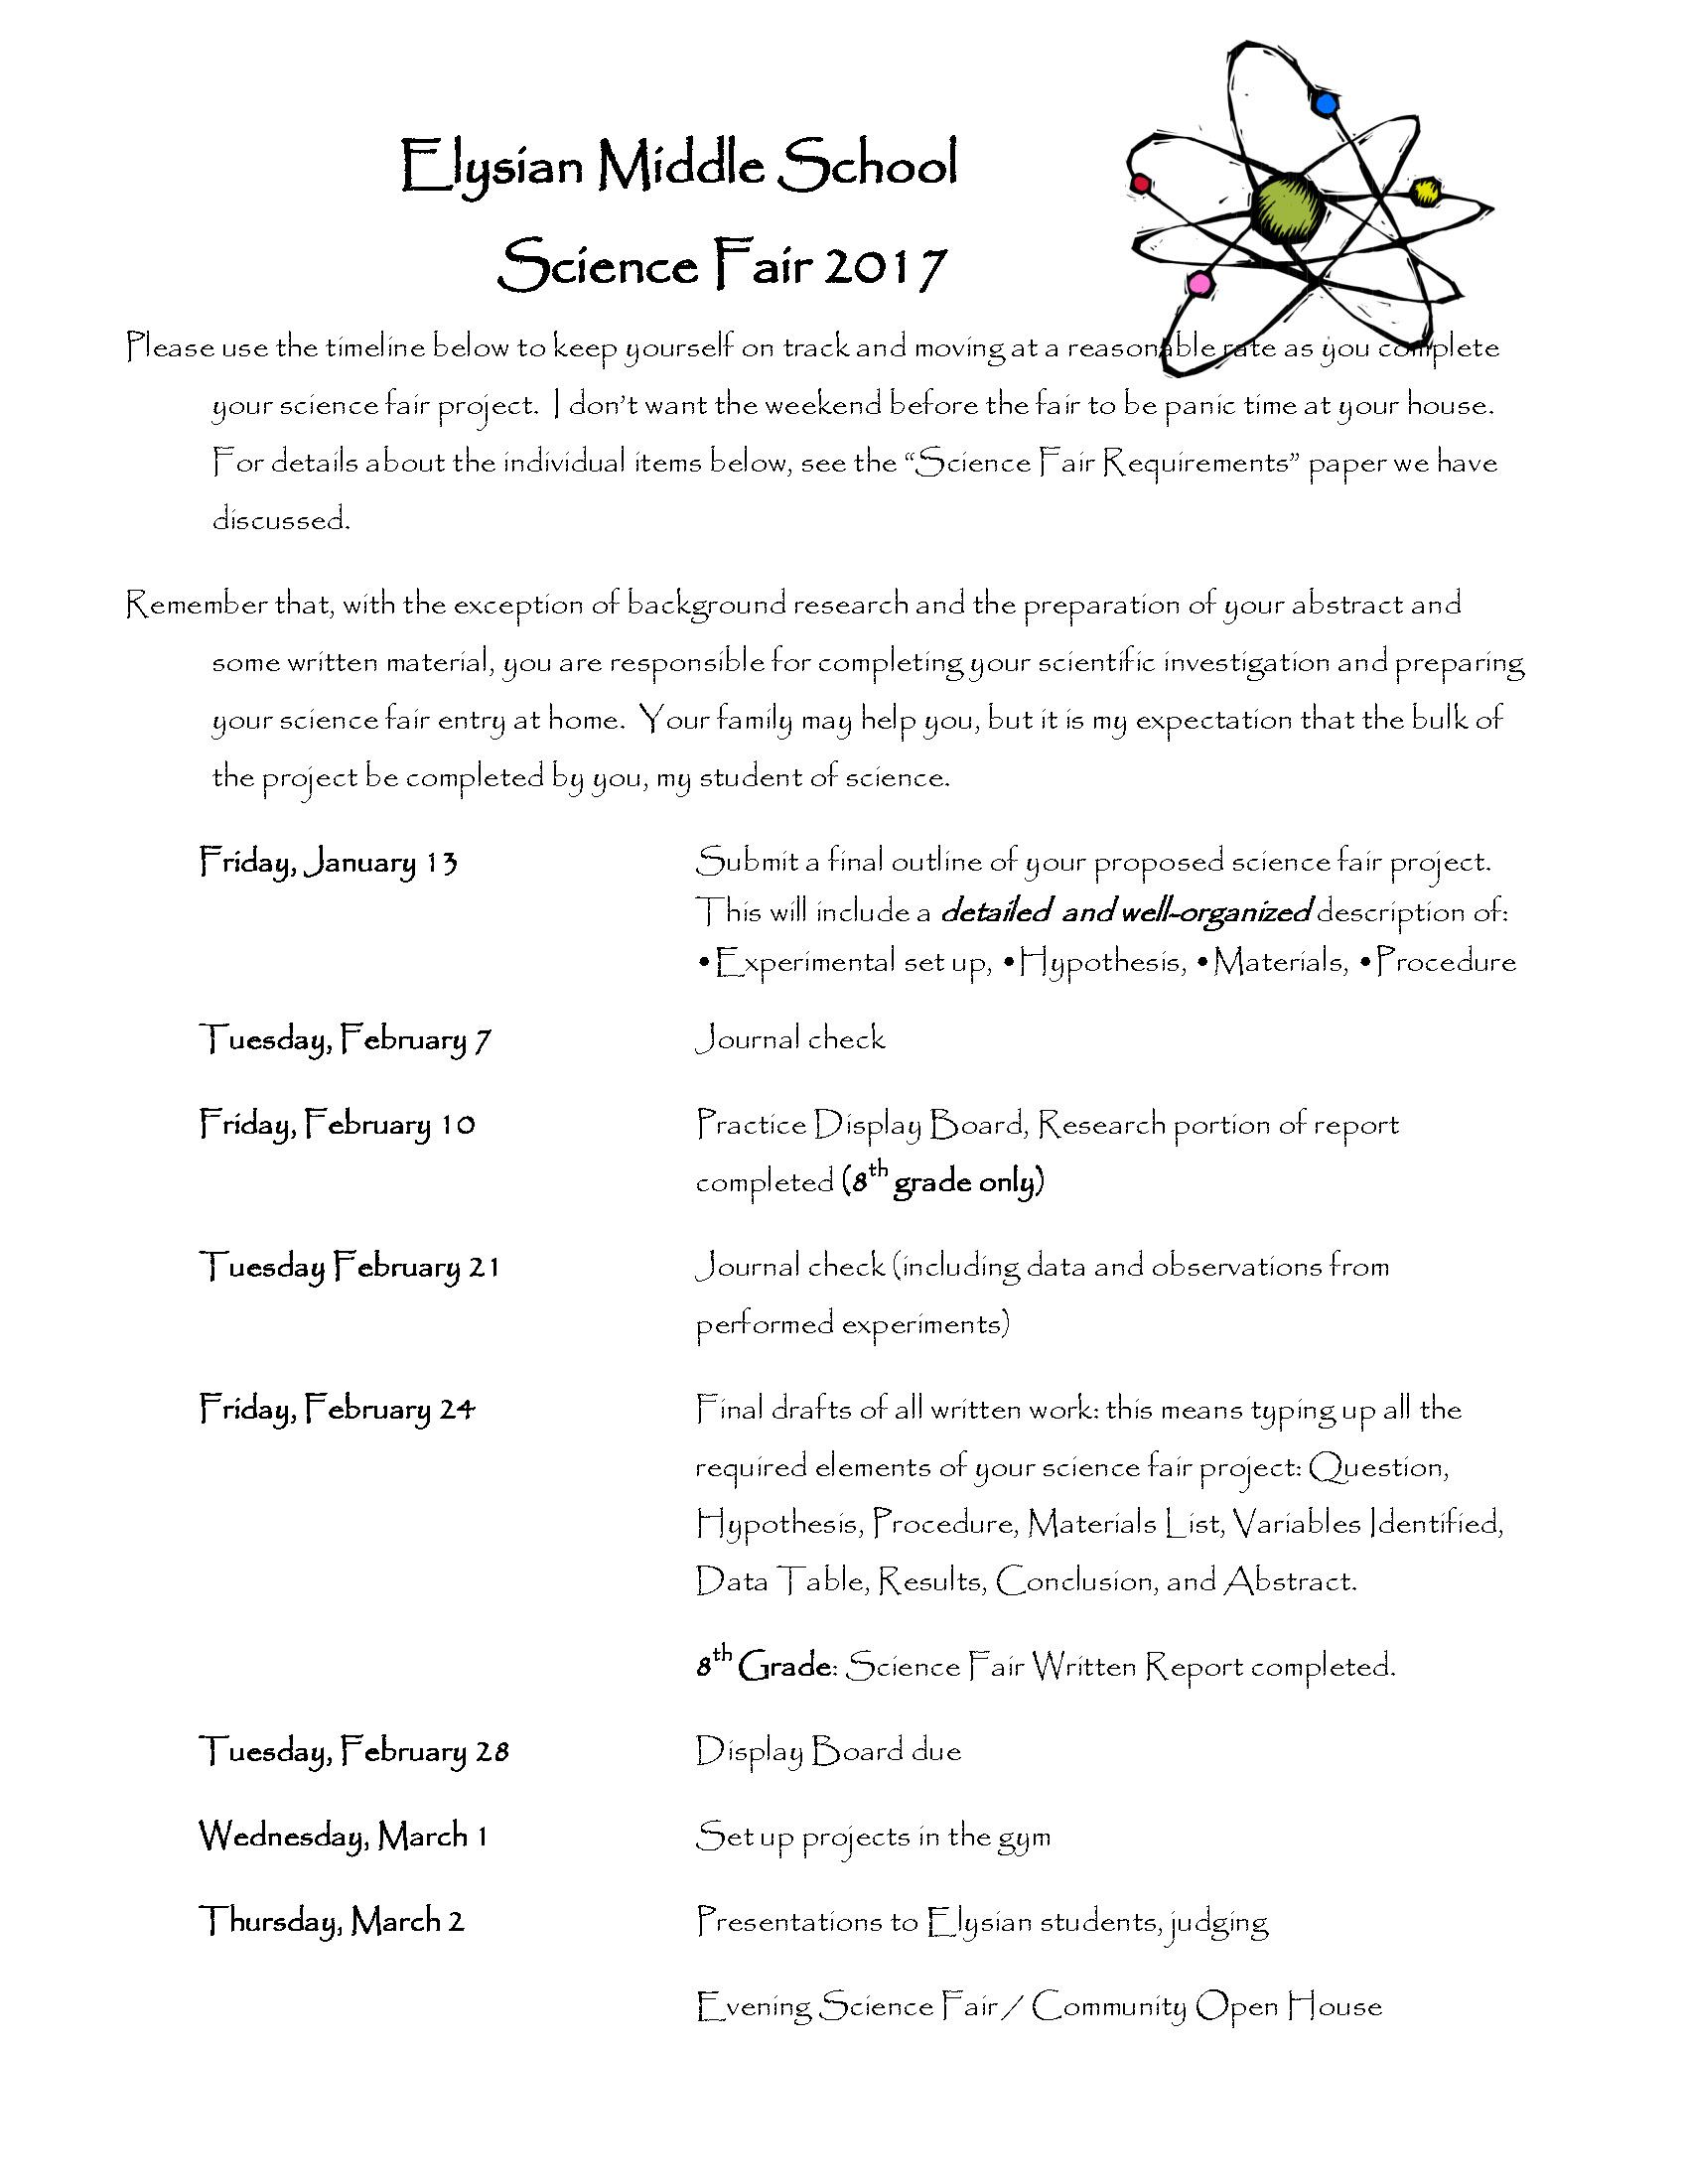 Middle School Science Fair Timeline | Elysian School